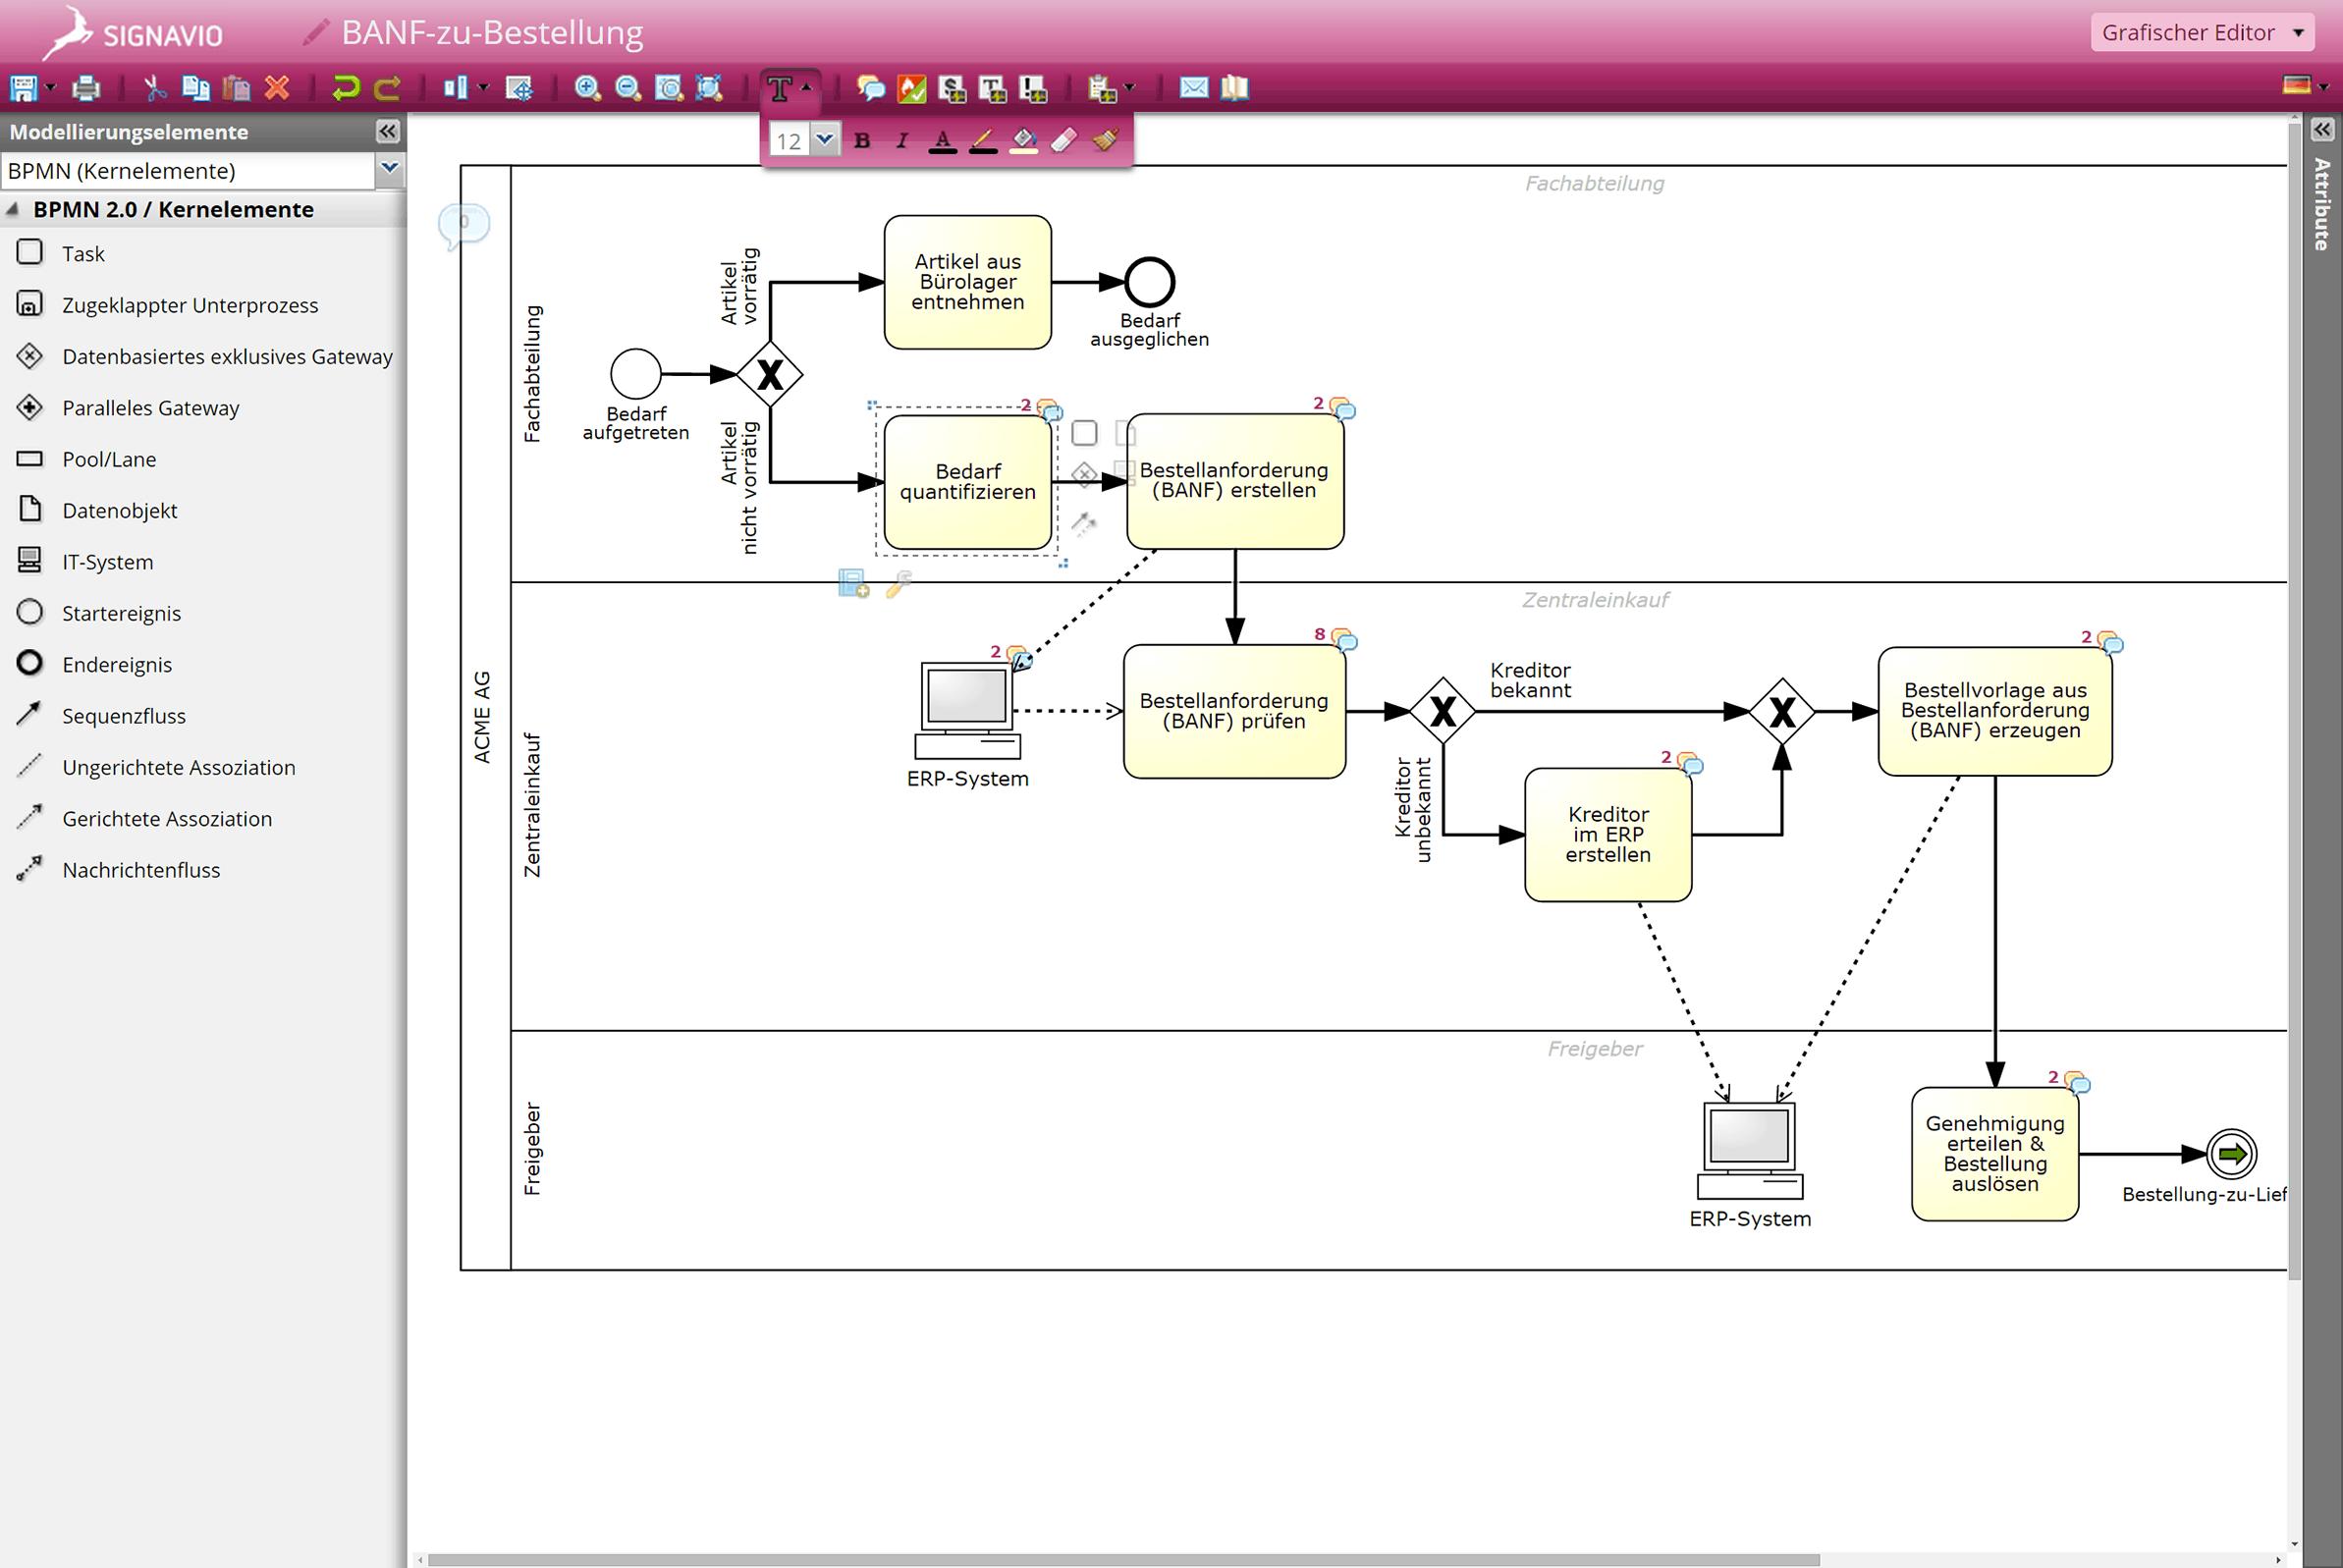 BPMN 2.0 Diagramm im Signavio Process Manager